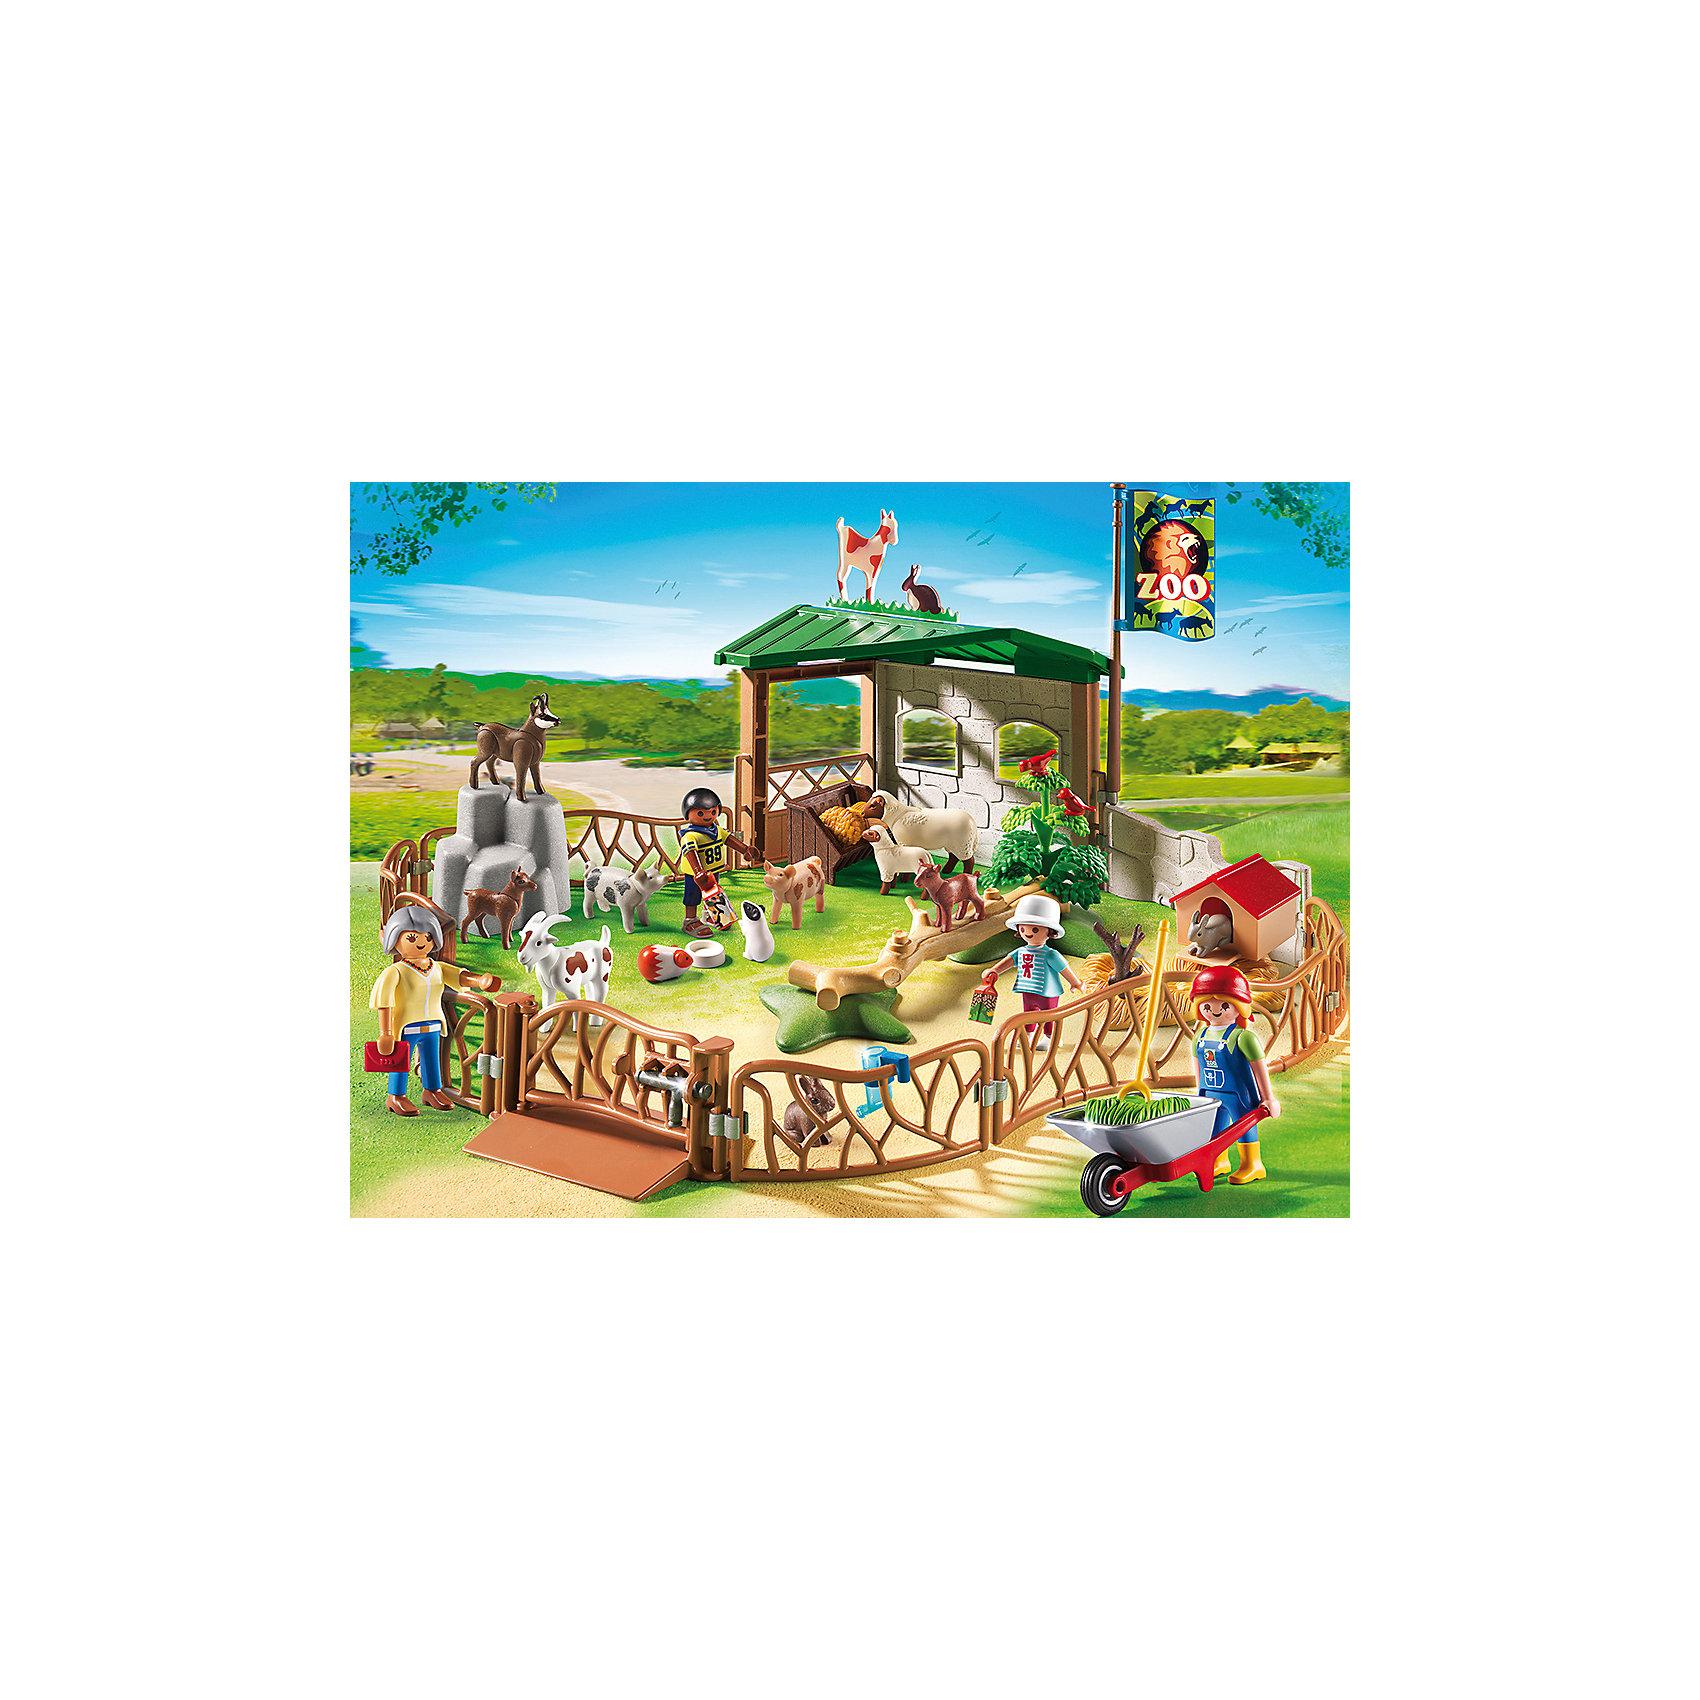 PLAYMOBIL® Детский контактный зоопарк, PLAYMOBIL playmobil® зоопарк стая фламинго playmobil